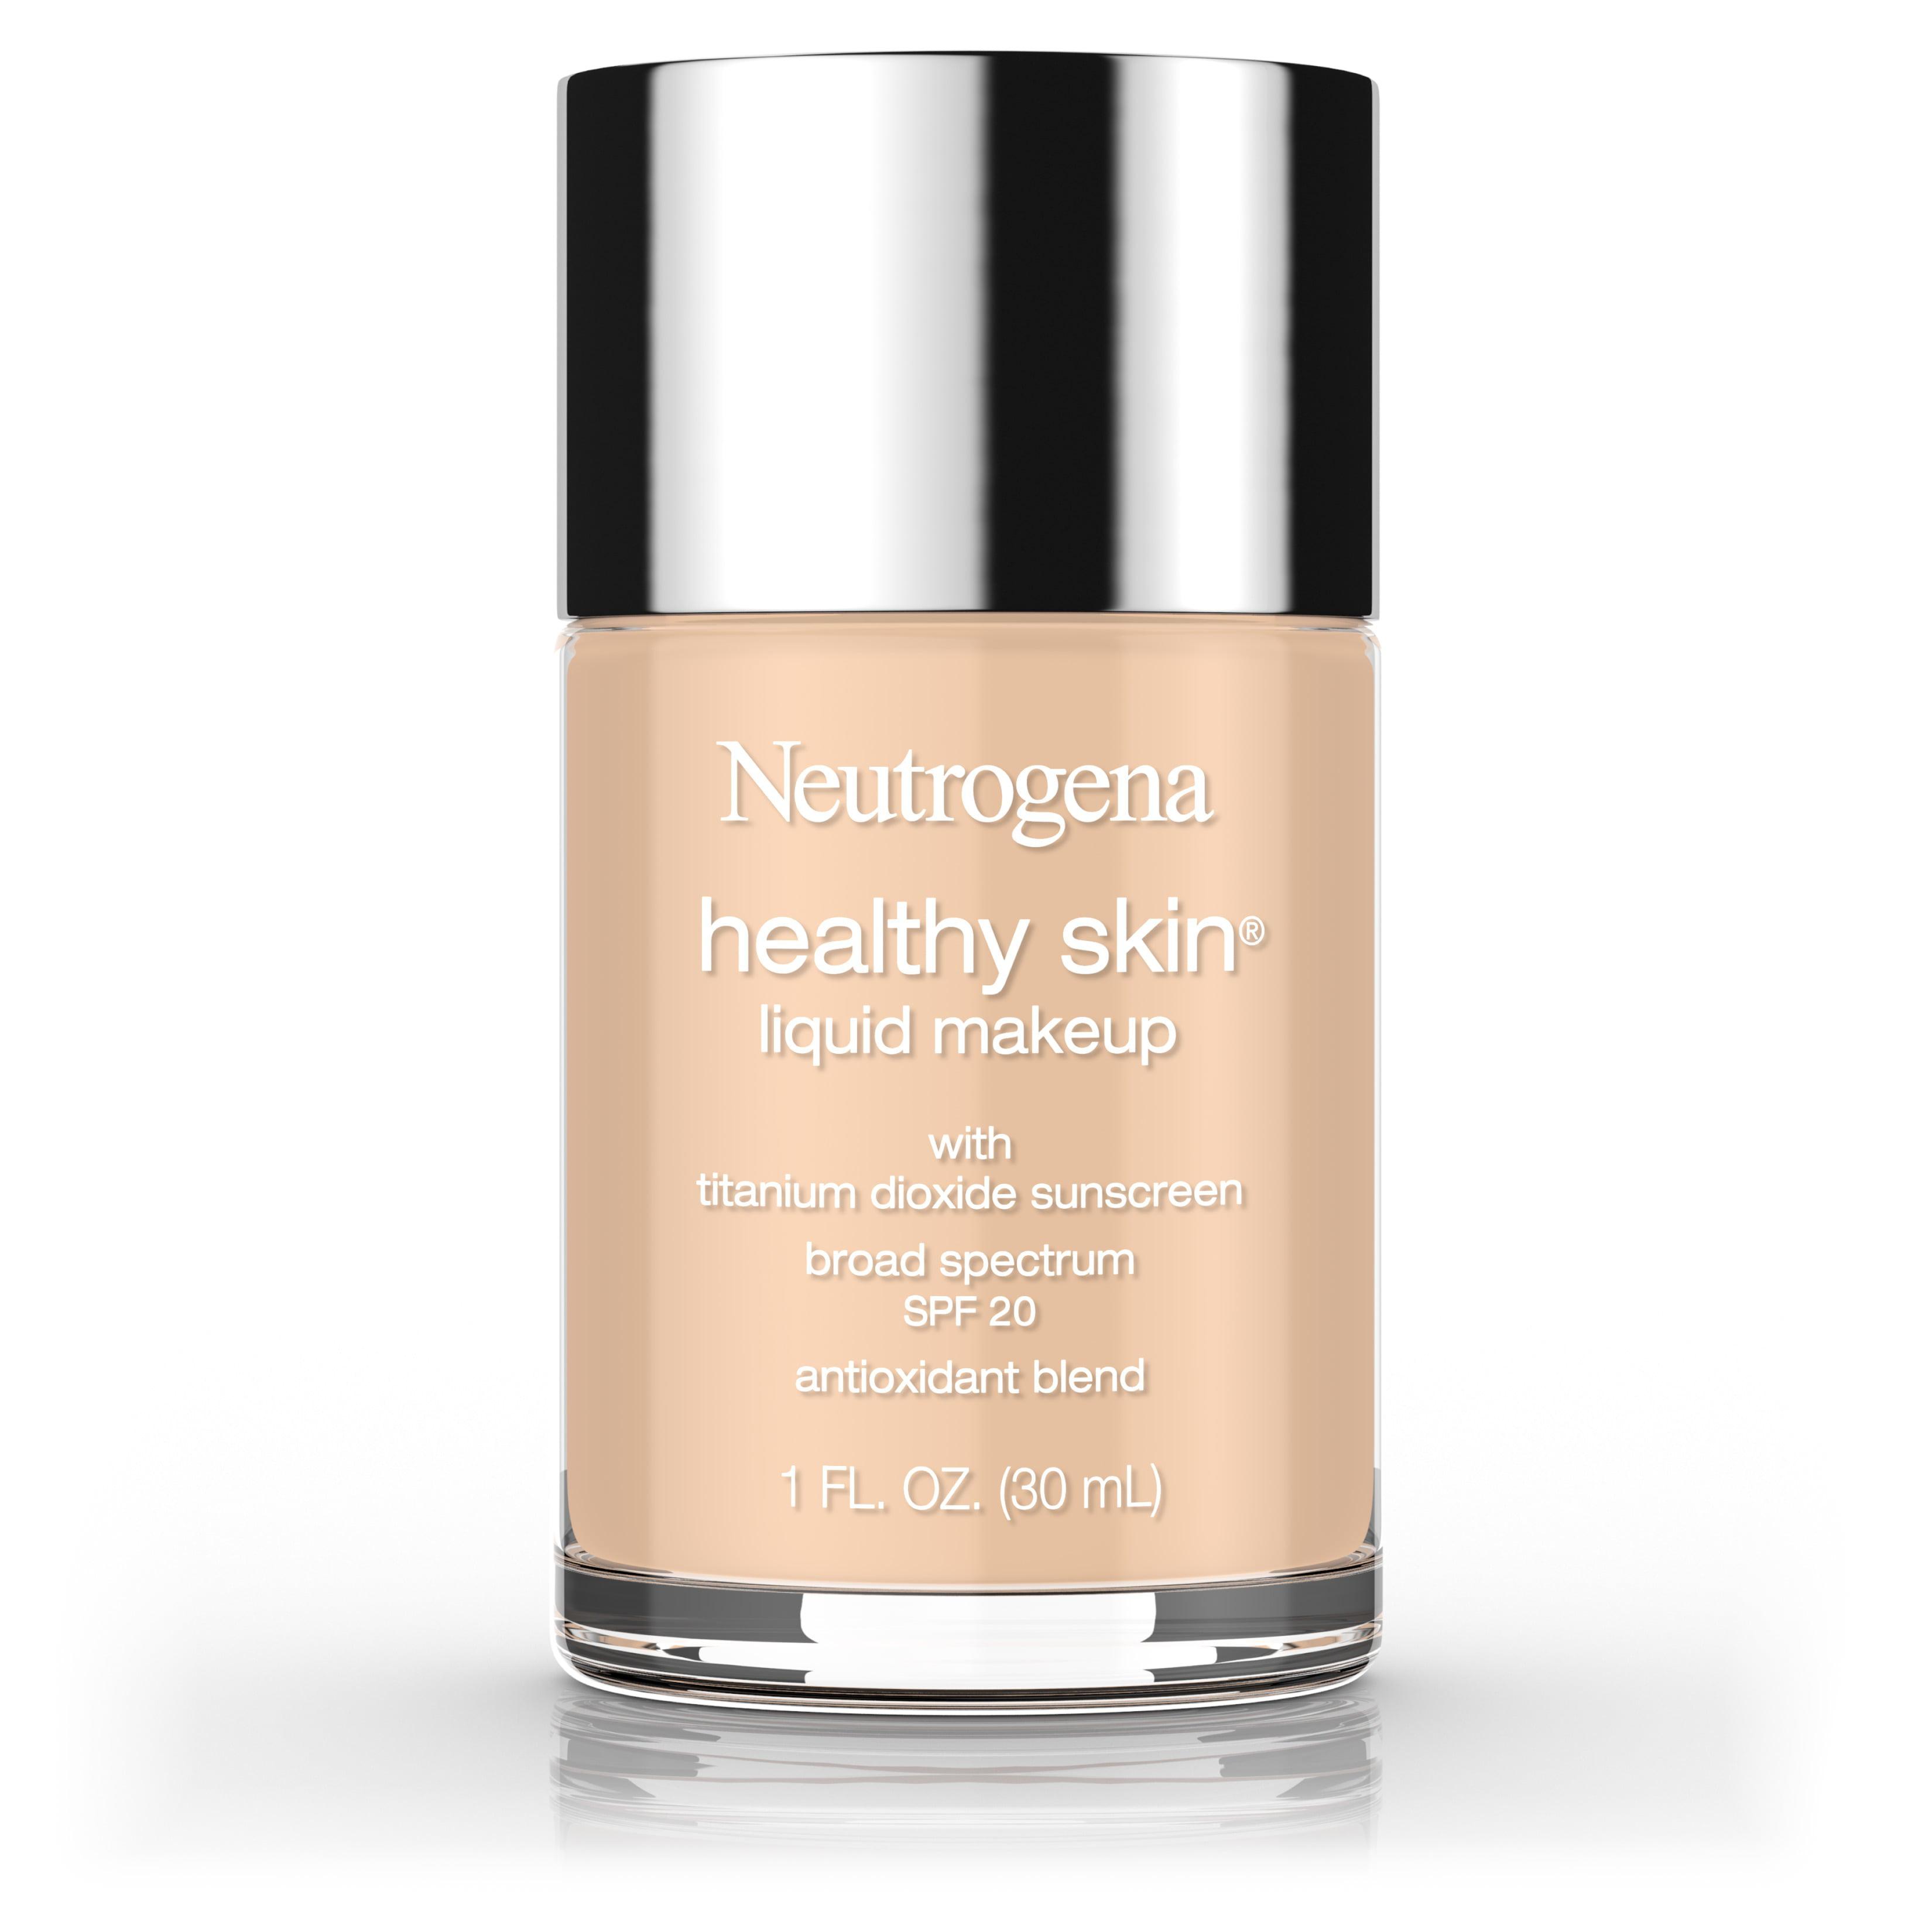 Johnson & Johnson Neutrogena Healthy Skin Liquid Makeup Foundation, Broad Spectrum Spf 20, 70 Fresh Beige, 1 oz.